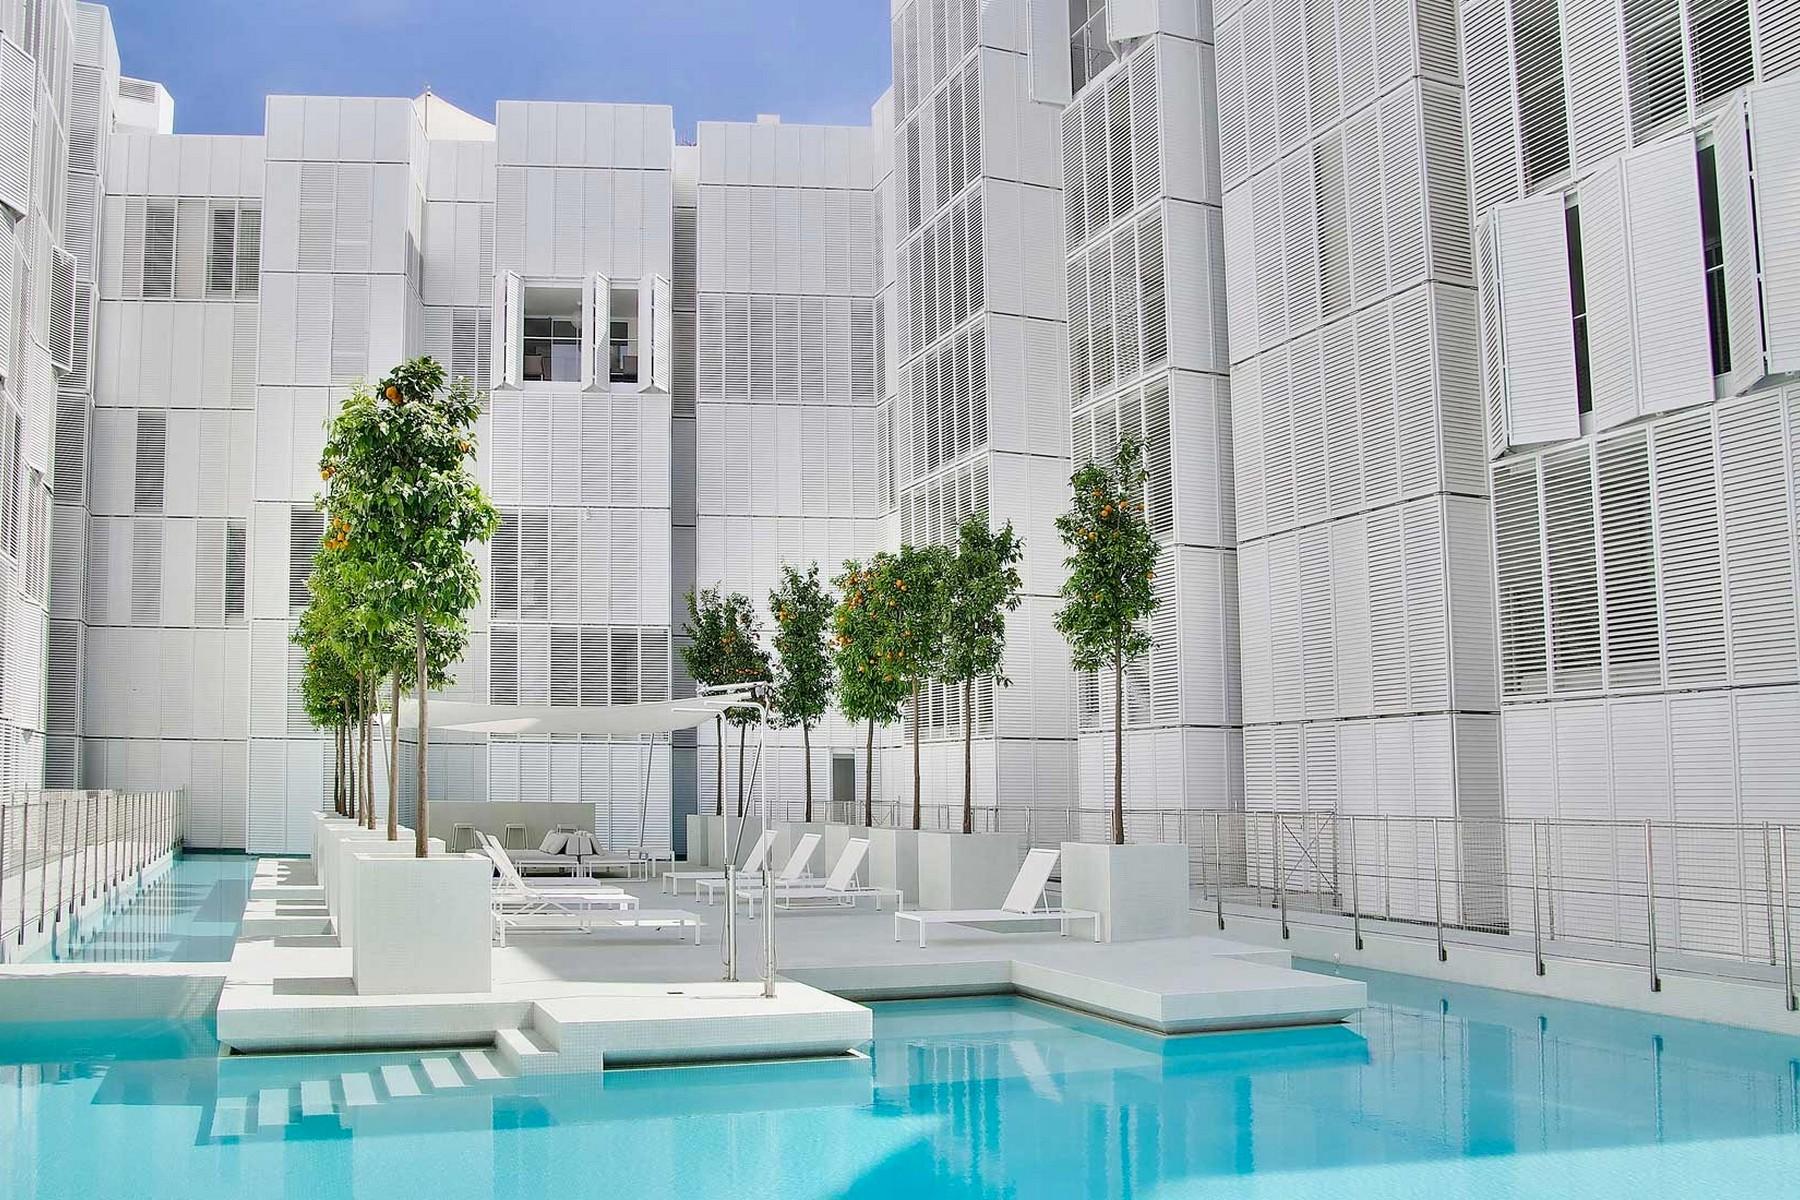 Apartment for Sale at Prestigious 2 bed apartment in Marina Botafoch Ibiza, Ibiza, 07800 Spain